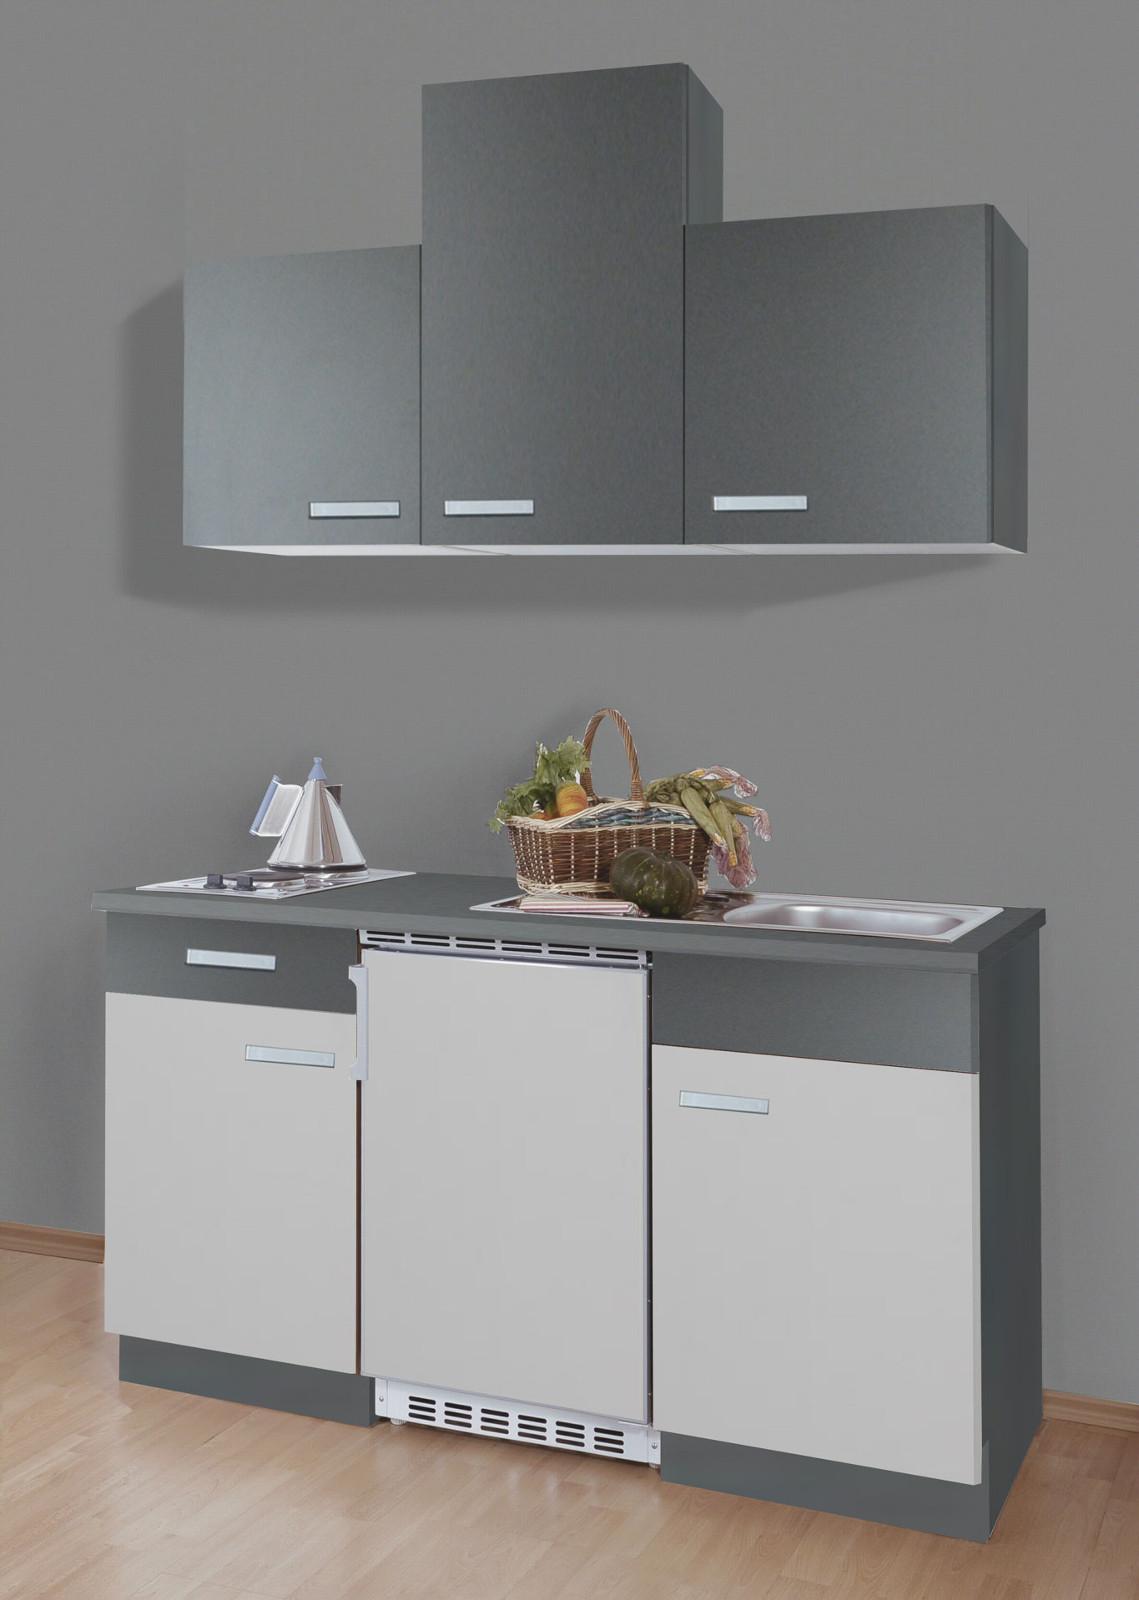 Full Size of Singleküche Ikea Värde Singleküche Zum Mitnehmen Singleküche Trends Singleküche Gebraucht Küche Singleküche